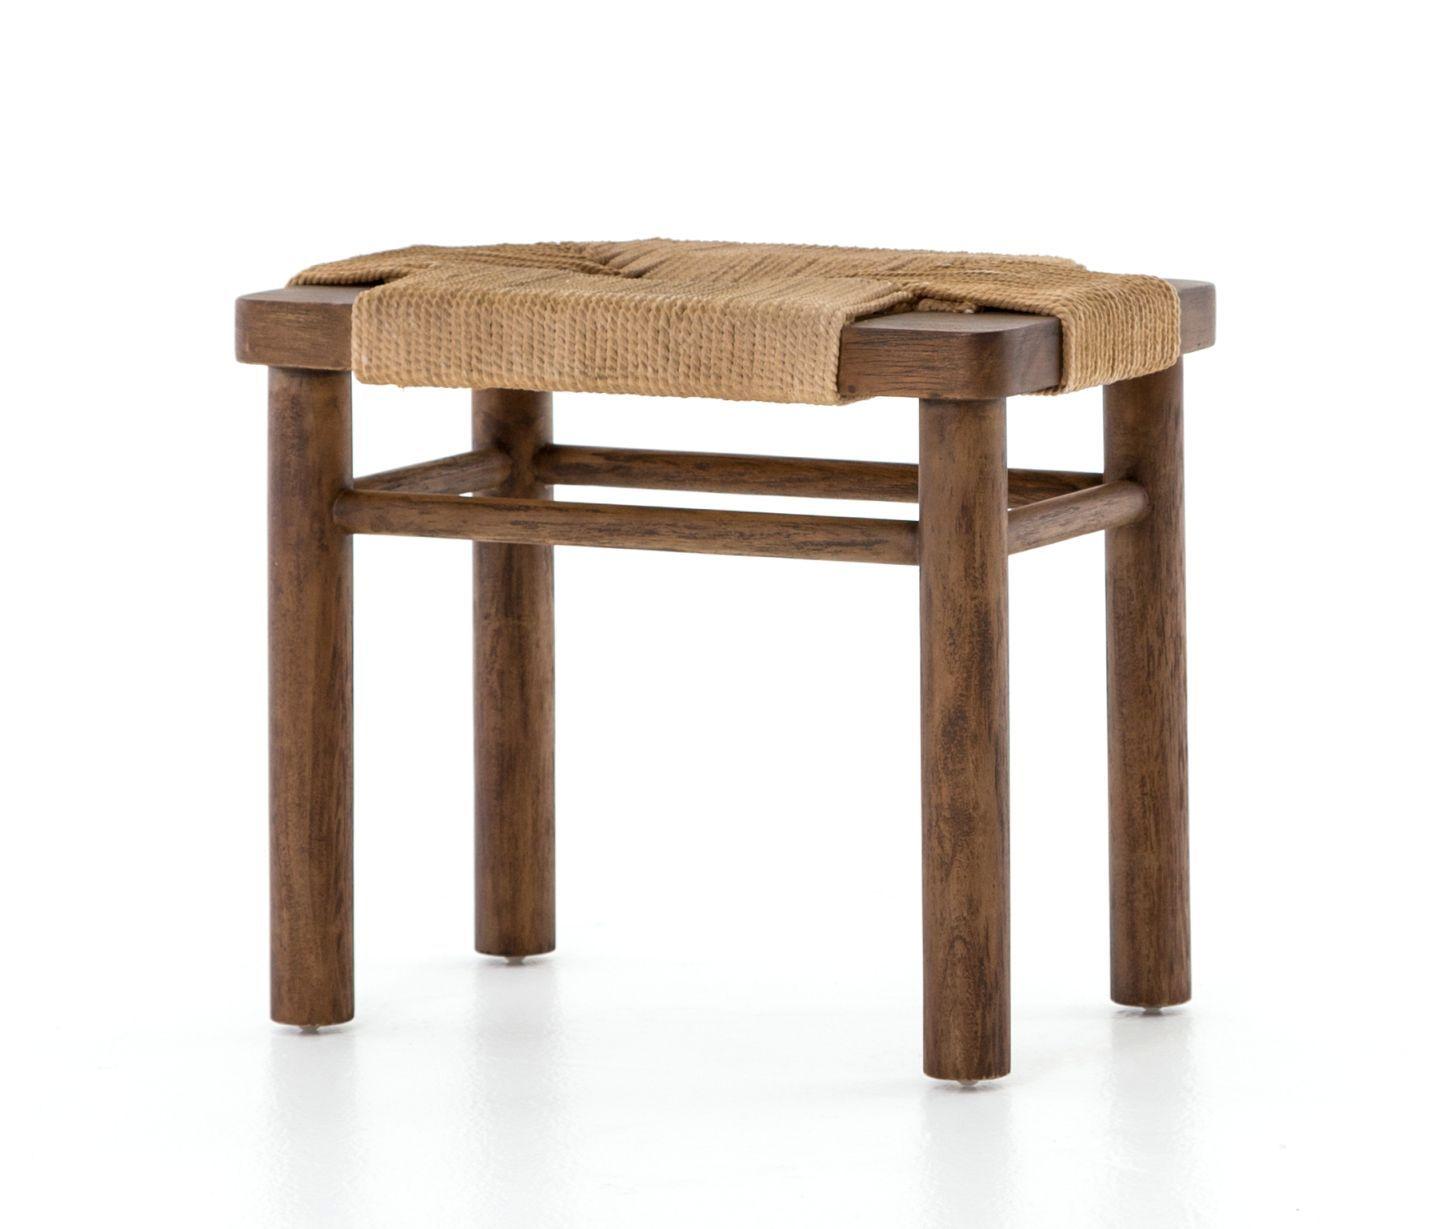 Brilliant Shawna Wood And Rope Stool Project Mount Vernon Stool Ibusinesslaw Wood Chair Design Ideas Ibusinesslaworg